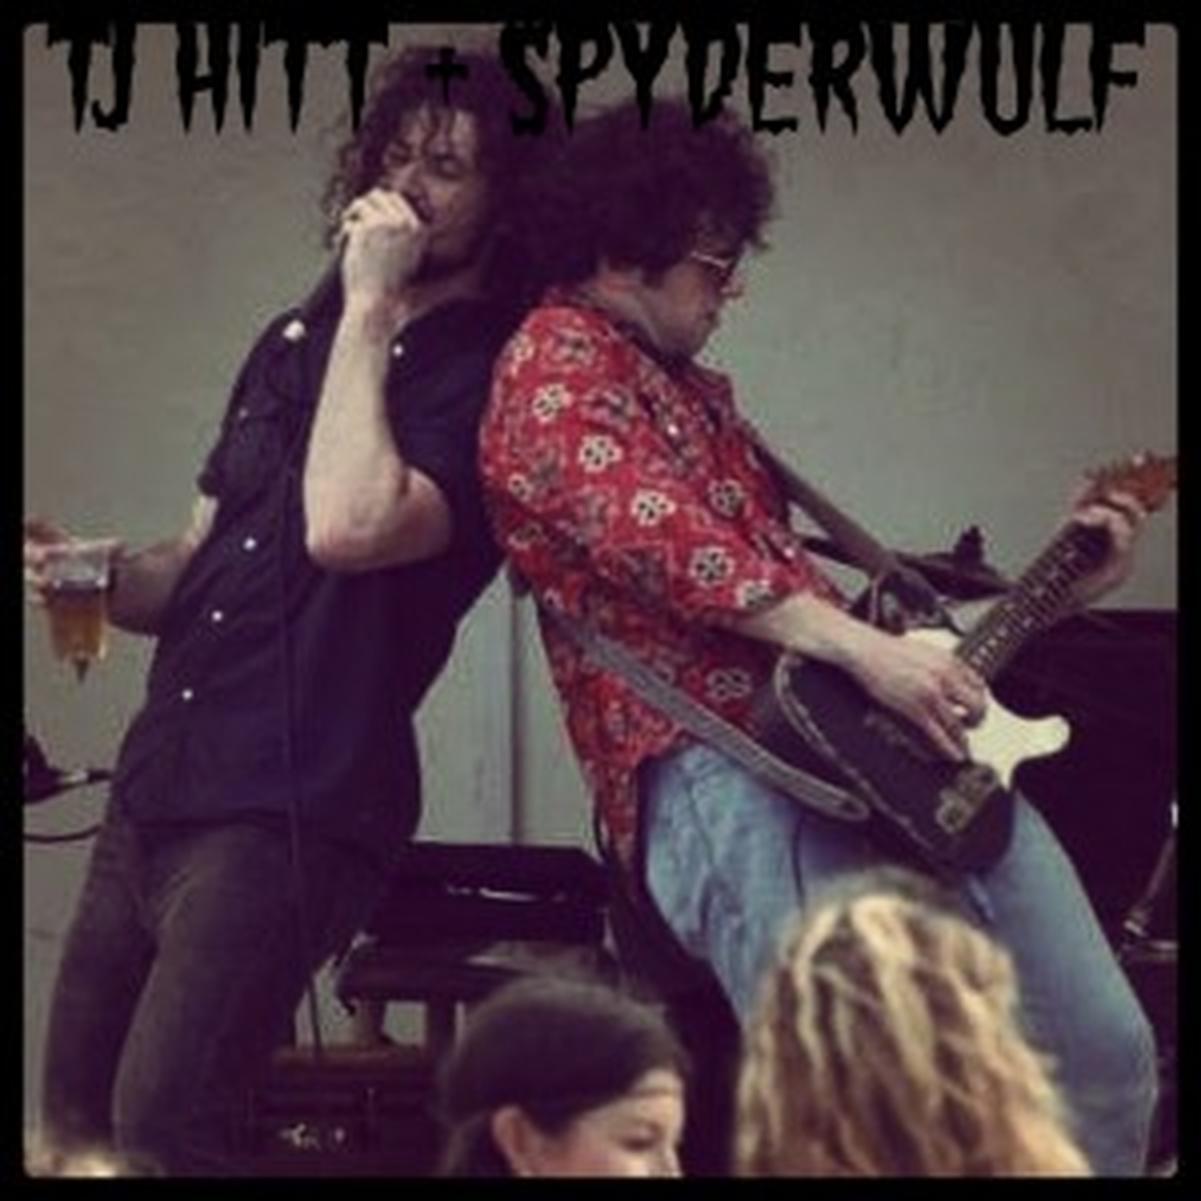 TJ HITT + SPYDERWULF